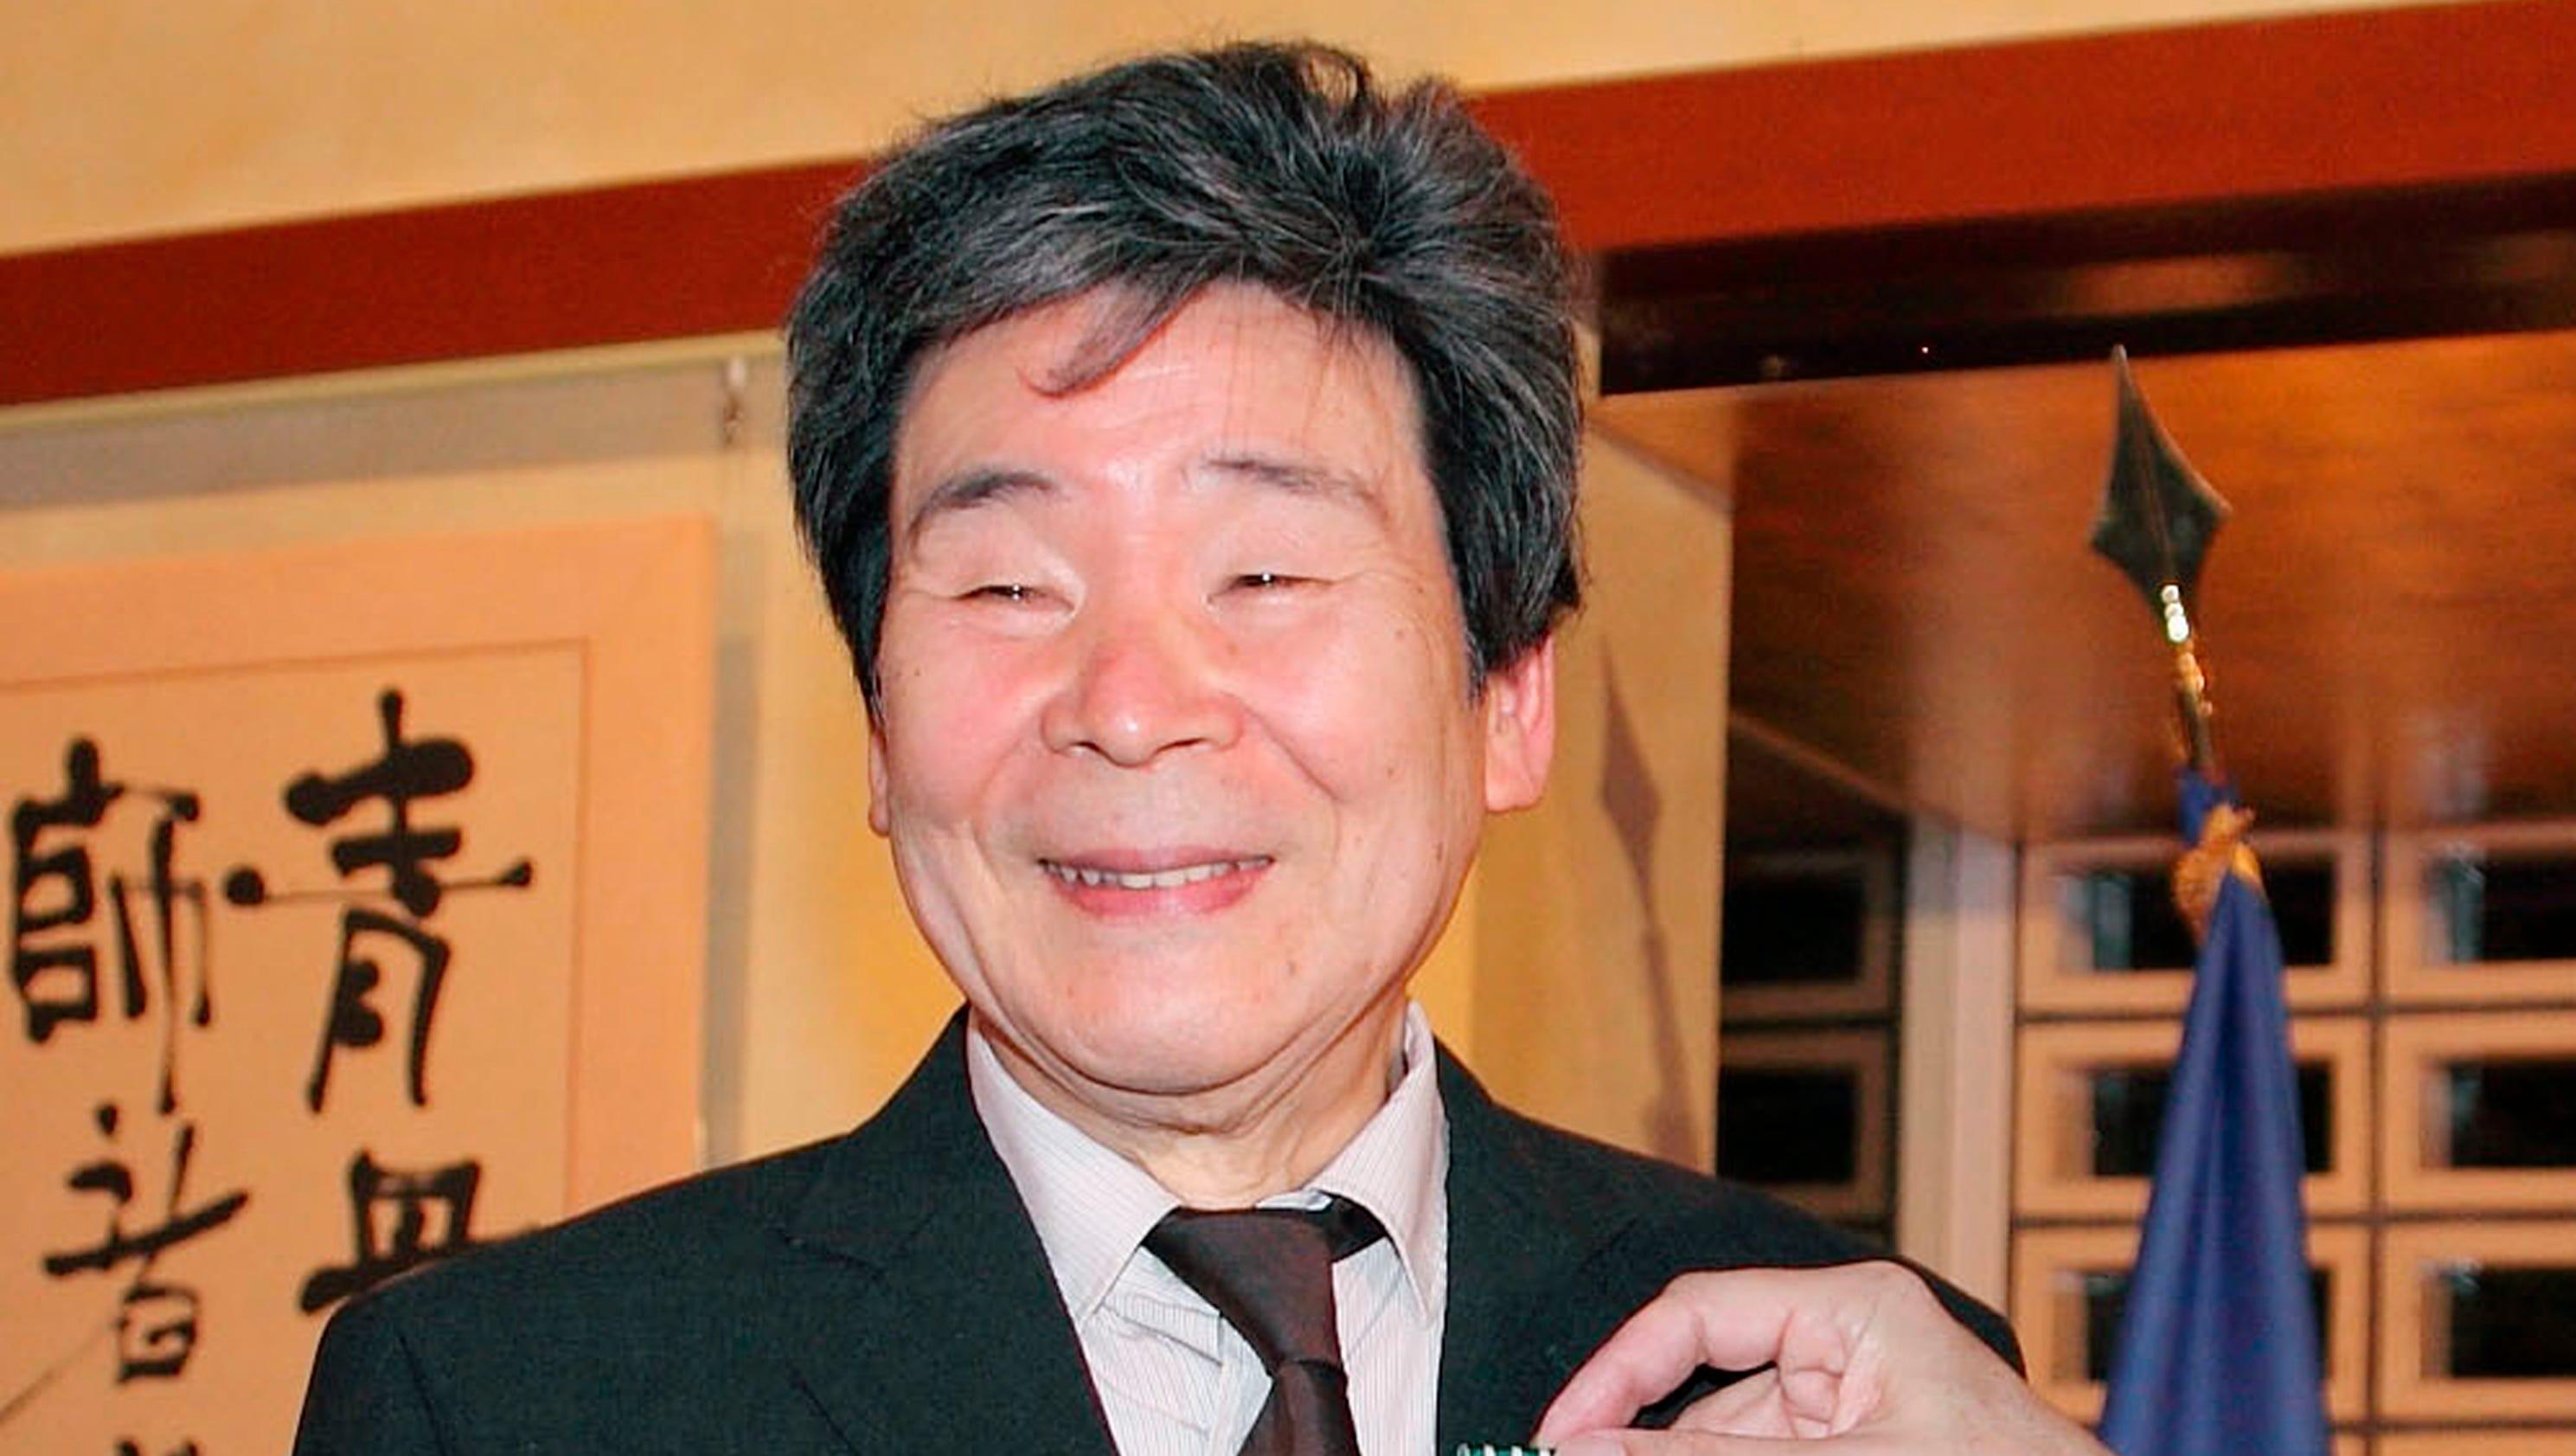 Isao Takahata, Studio Ghibli co-founder, dies at 82